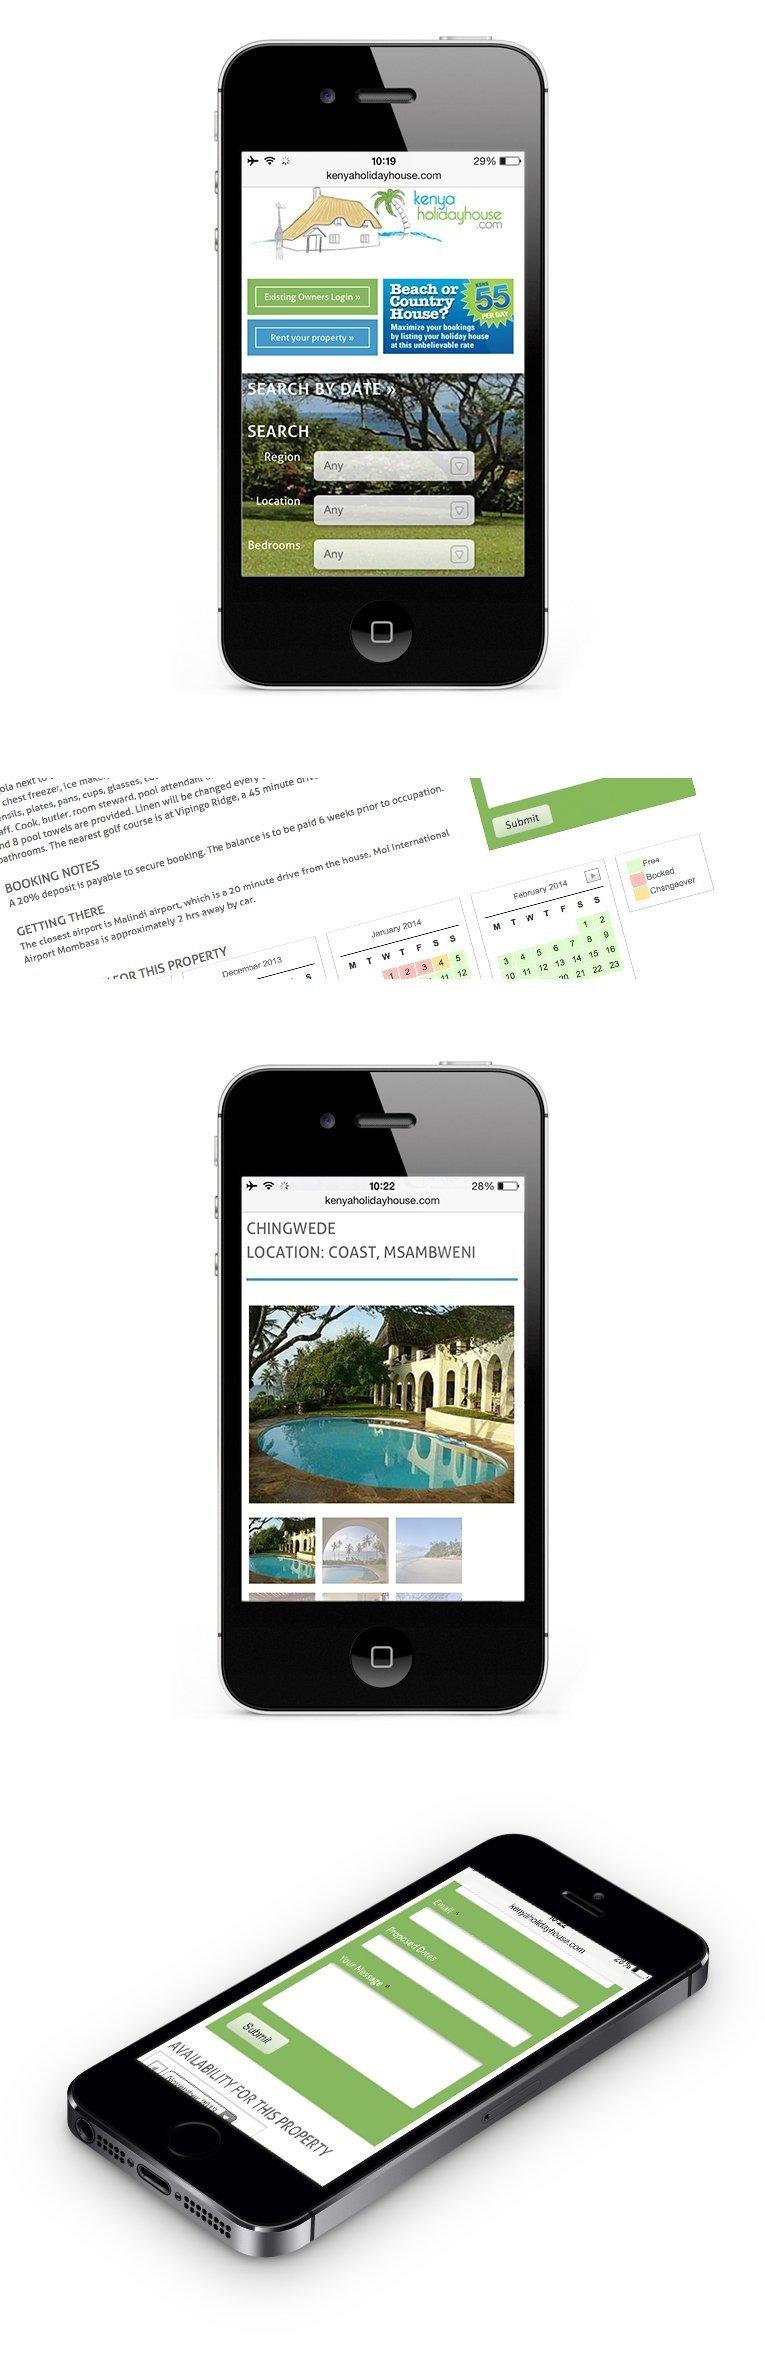 Mobile Responsive design by website designer Cornwall